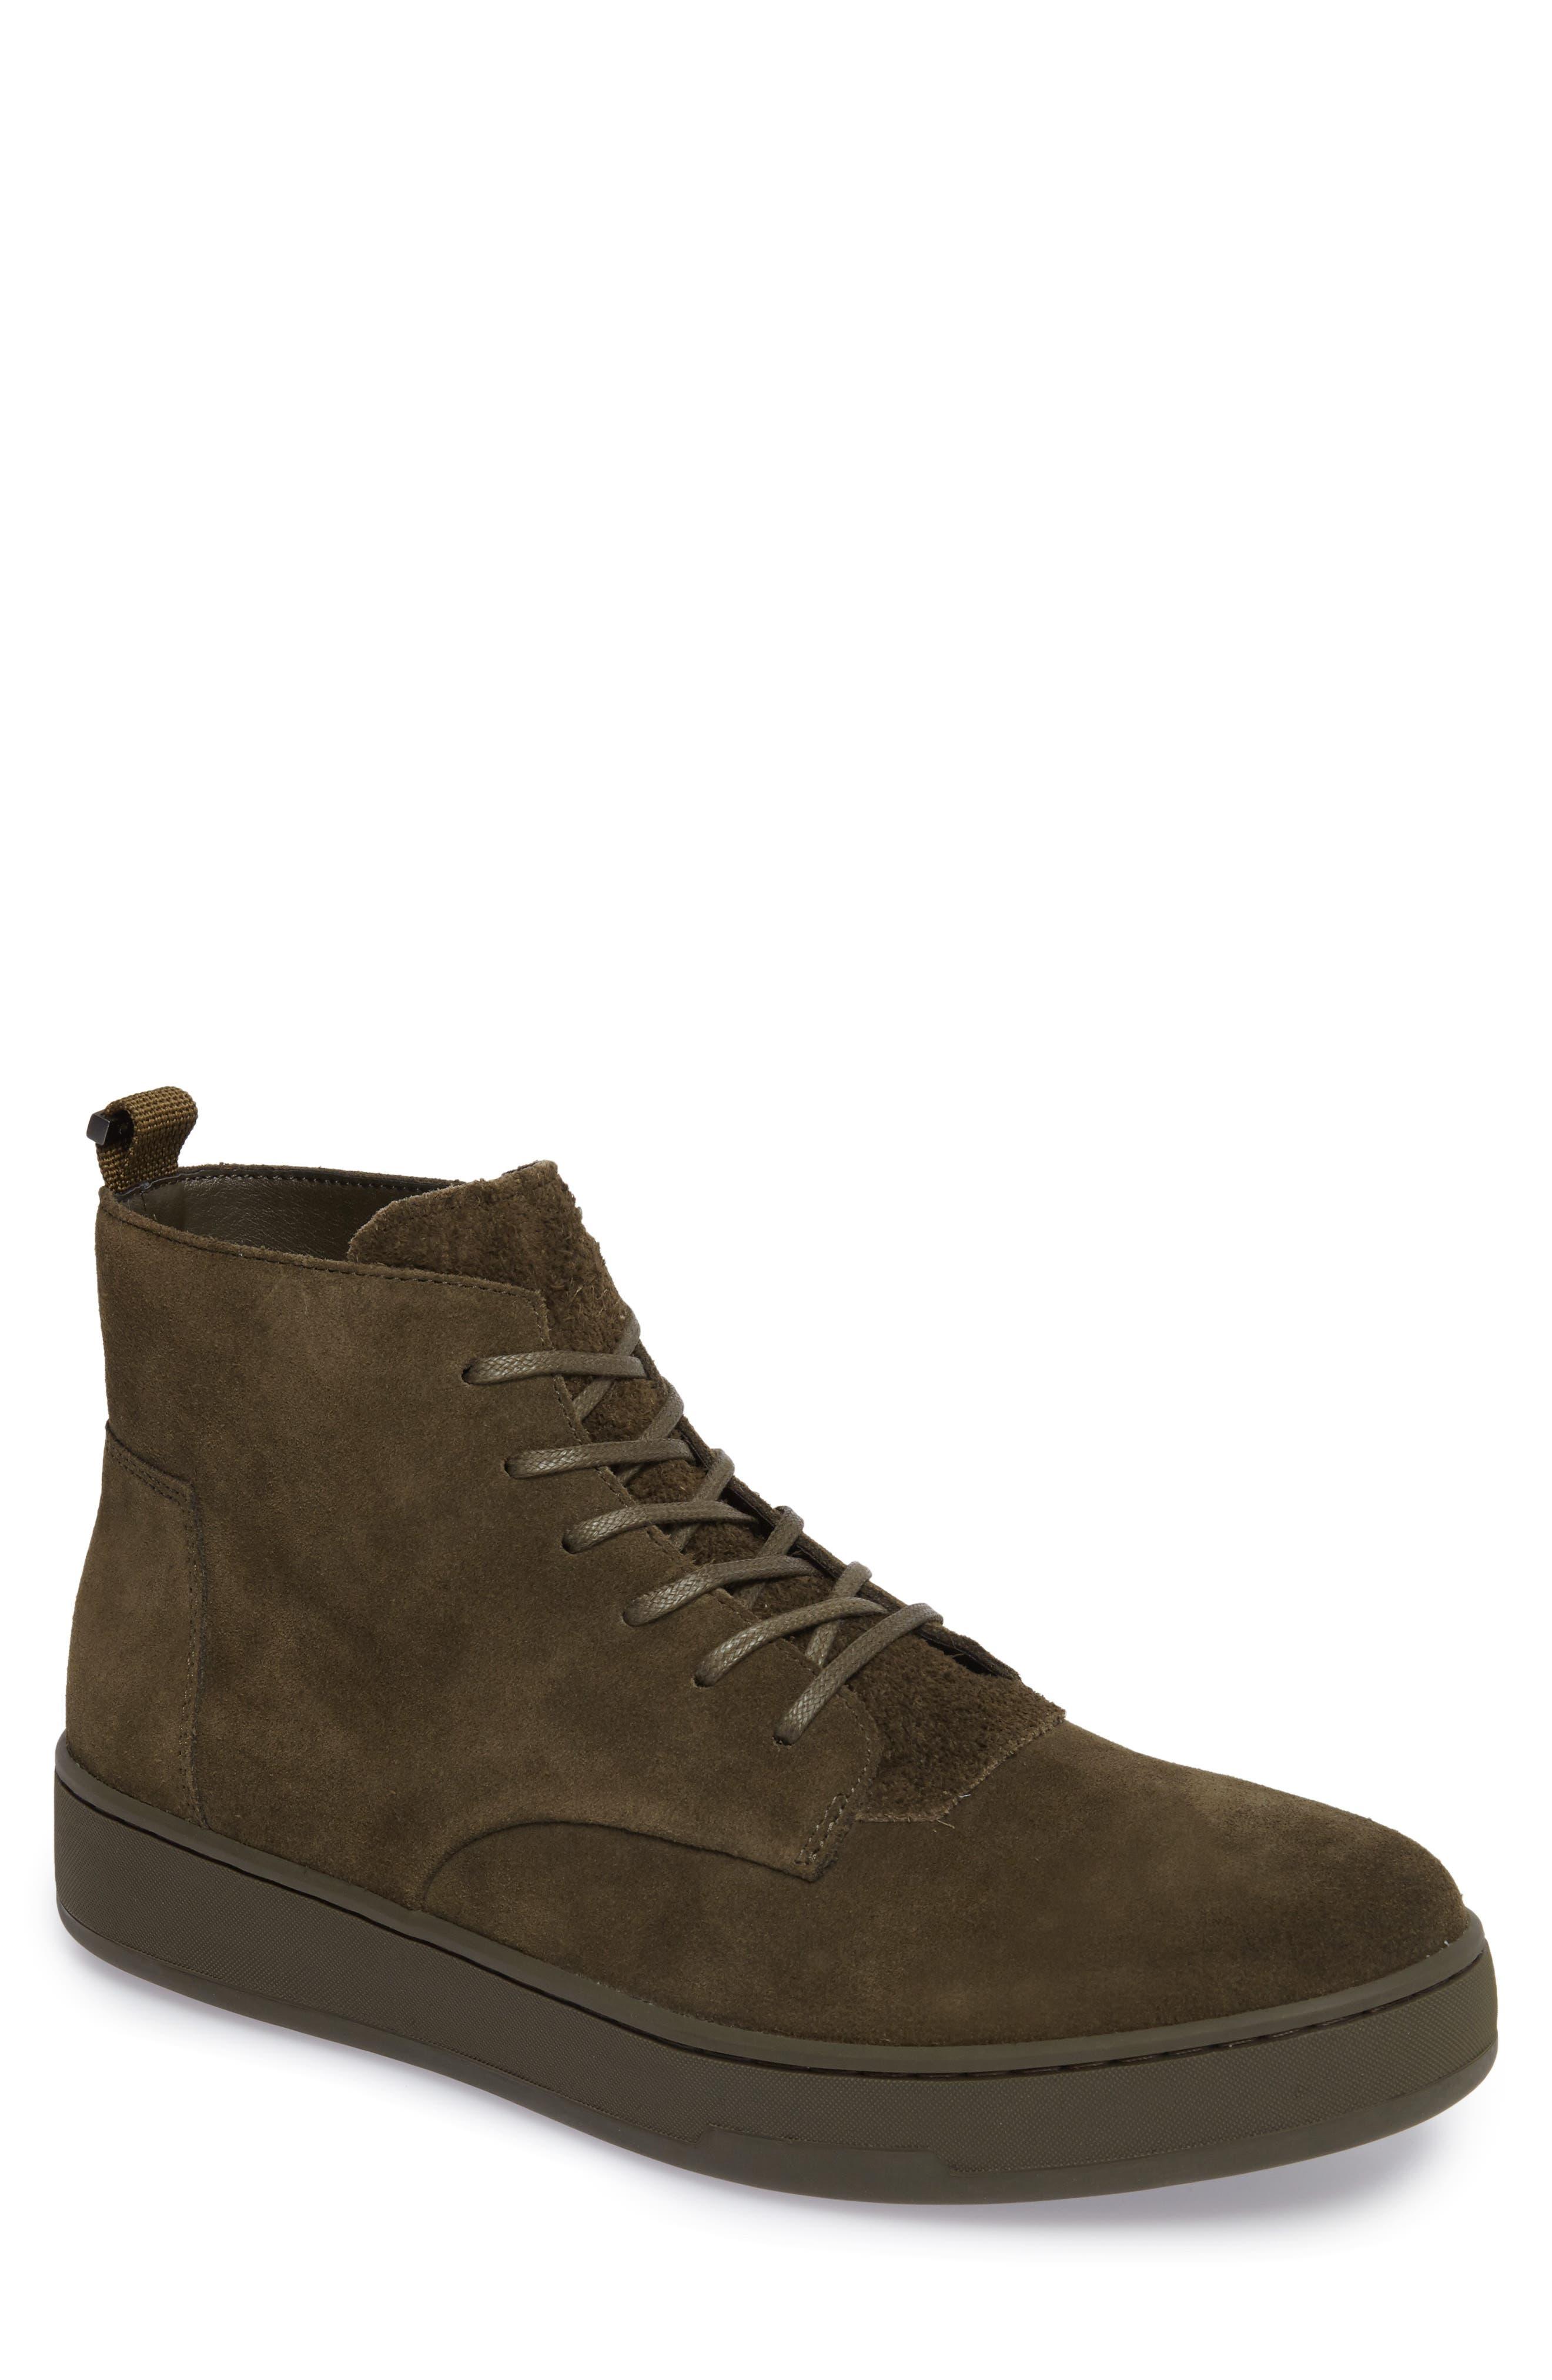 Alternate Image 1 Selected - Calvin Klein Natel Sneaker (Men)